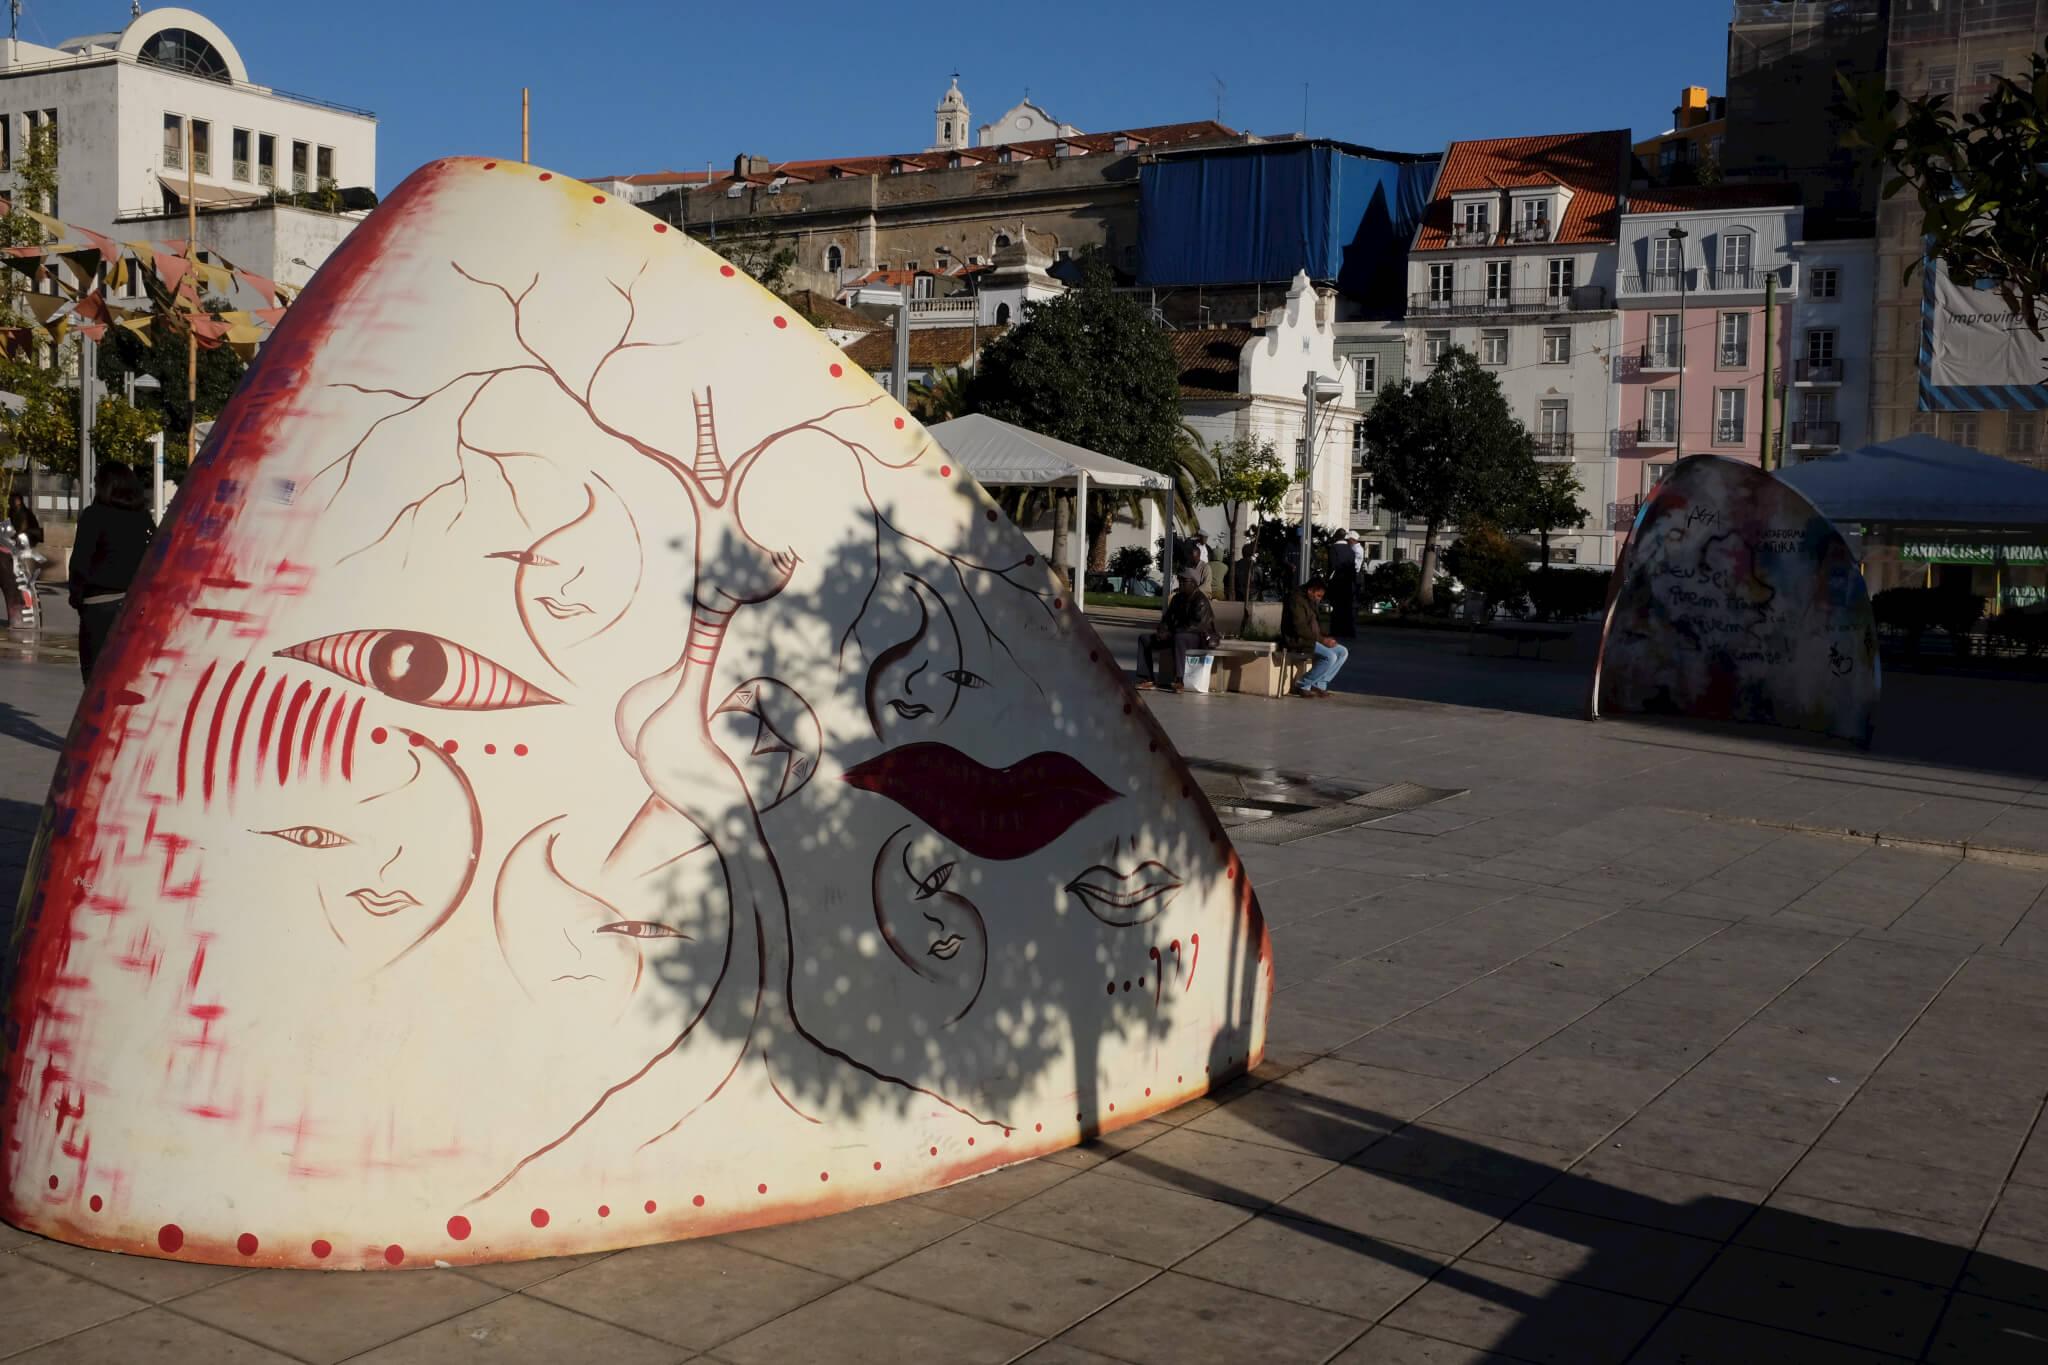 MartimMoniz_by_PetteriSulonen_Lisboa_DSCF1257_(11268763085)